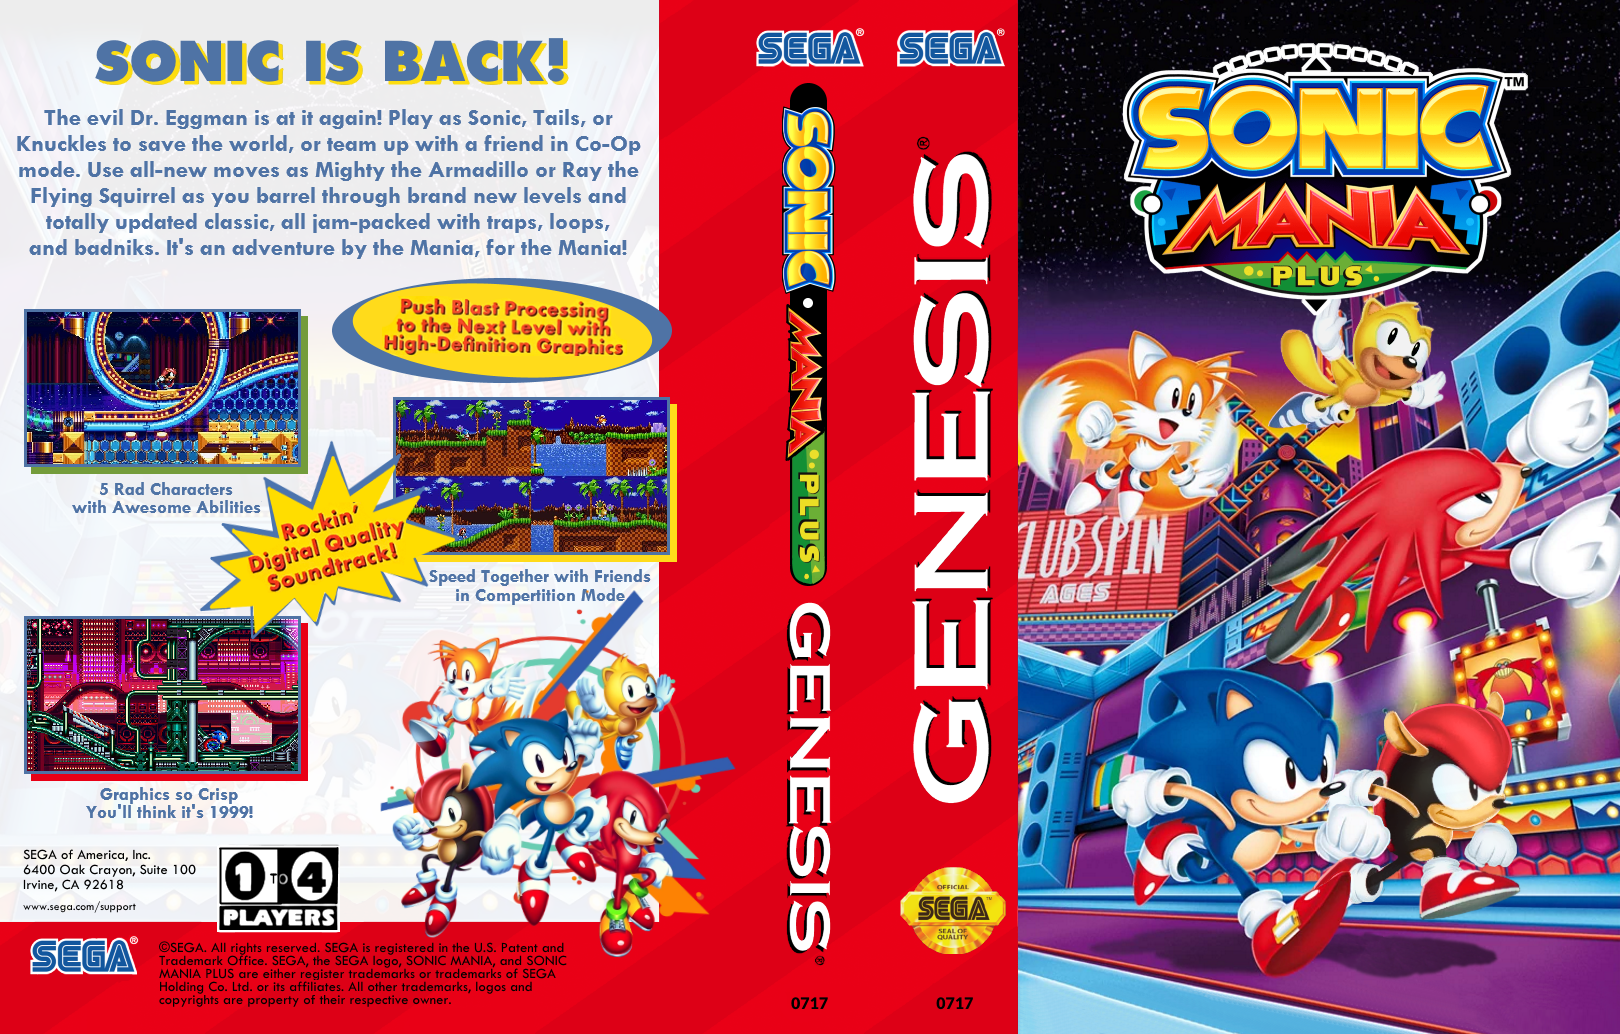 Sonic Mania Plus Reversible Sega Genesis Cover By Peasters On Deviantart